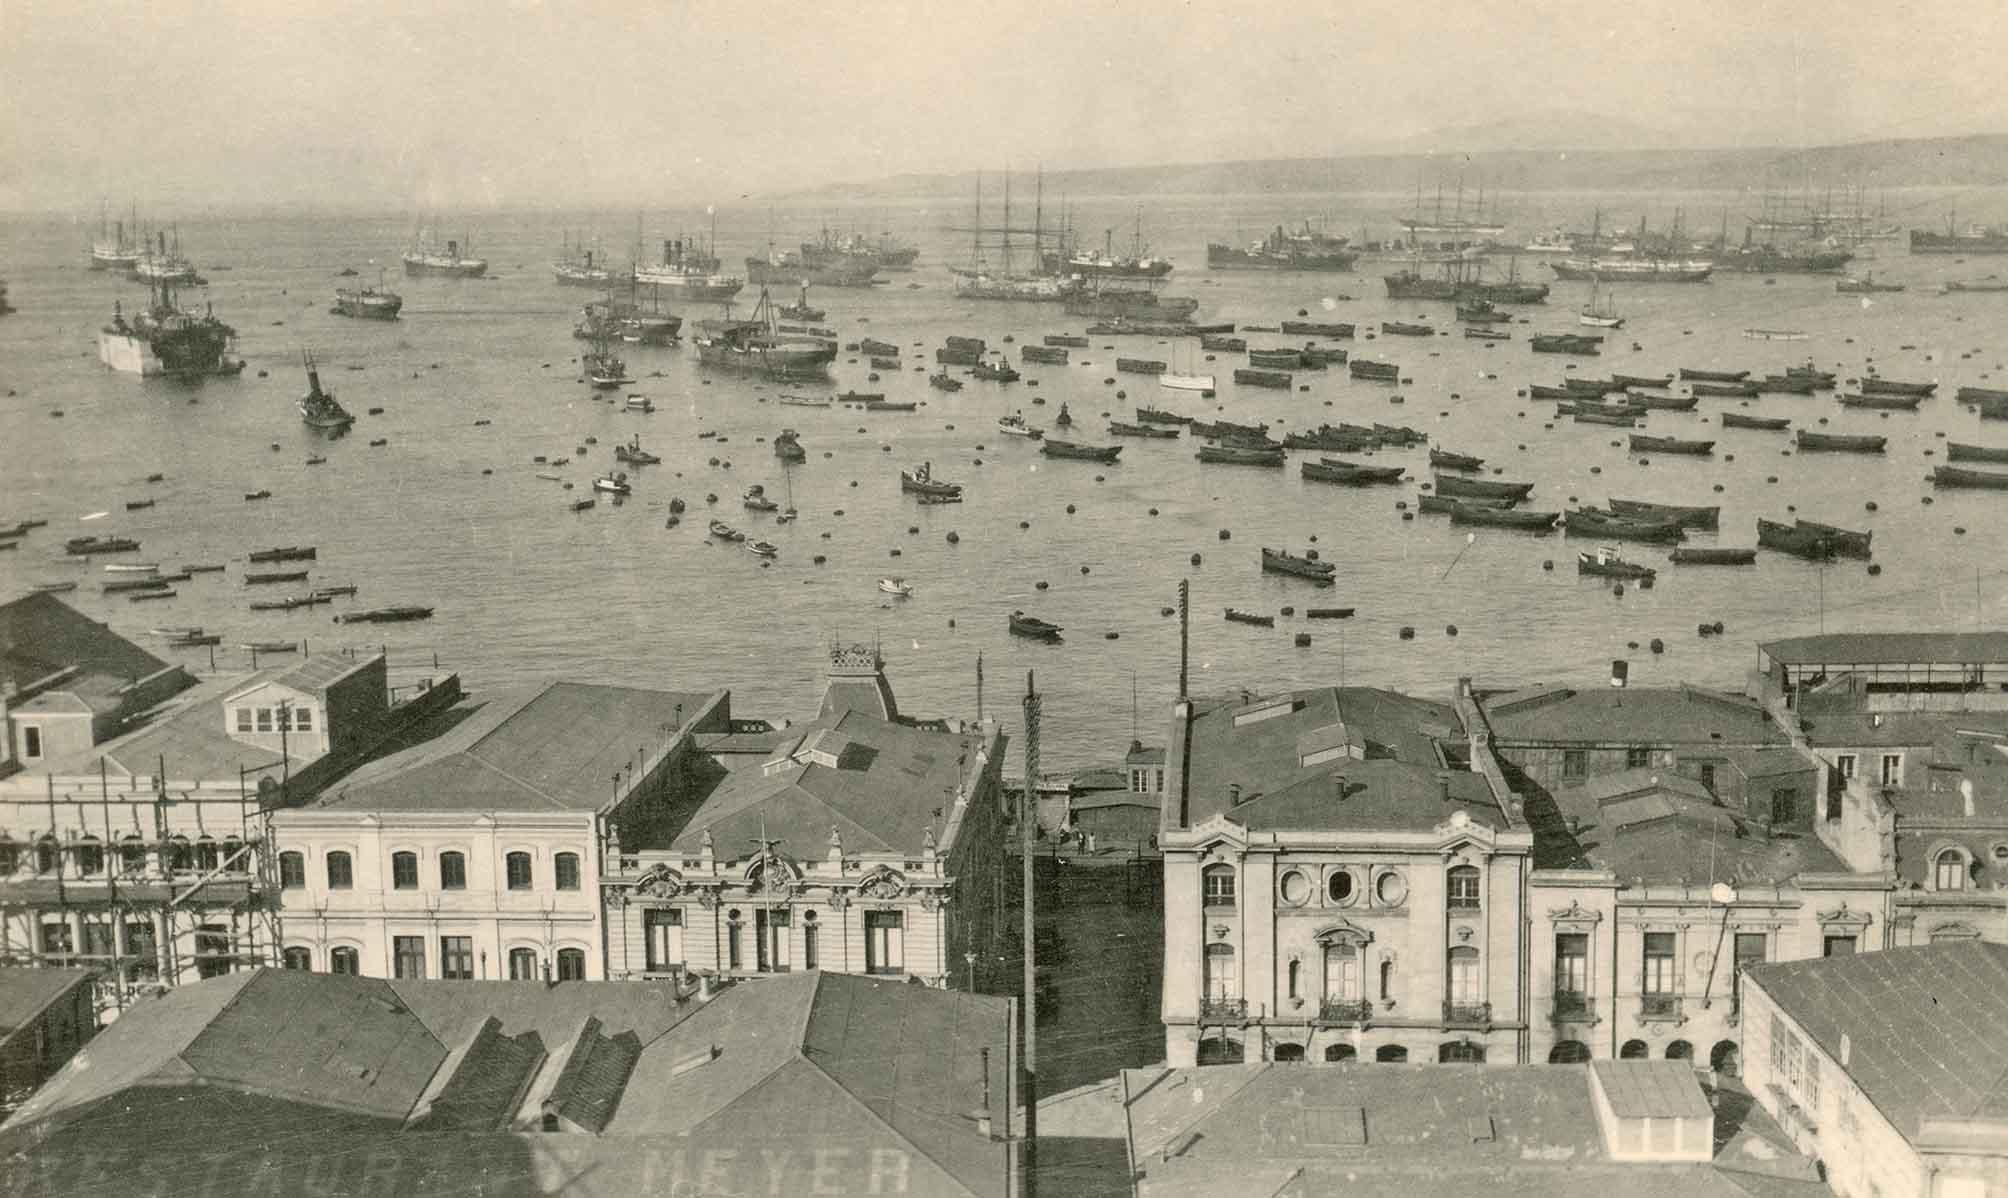 Enterreno - Fotos históricas de chile - fotos antiguas de Chile - Bahía de Valparaíso a principios de 1900